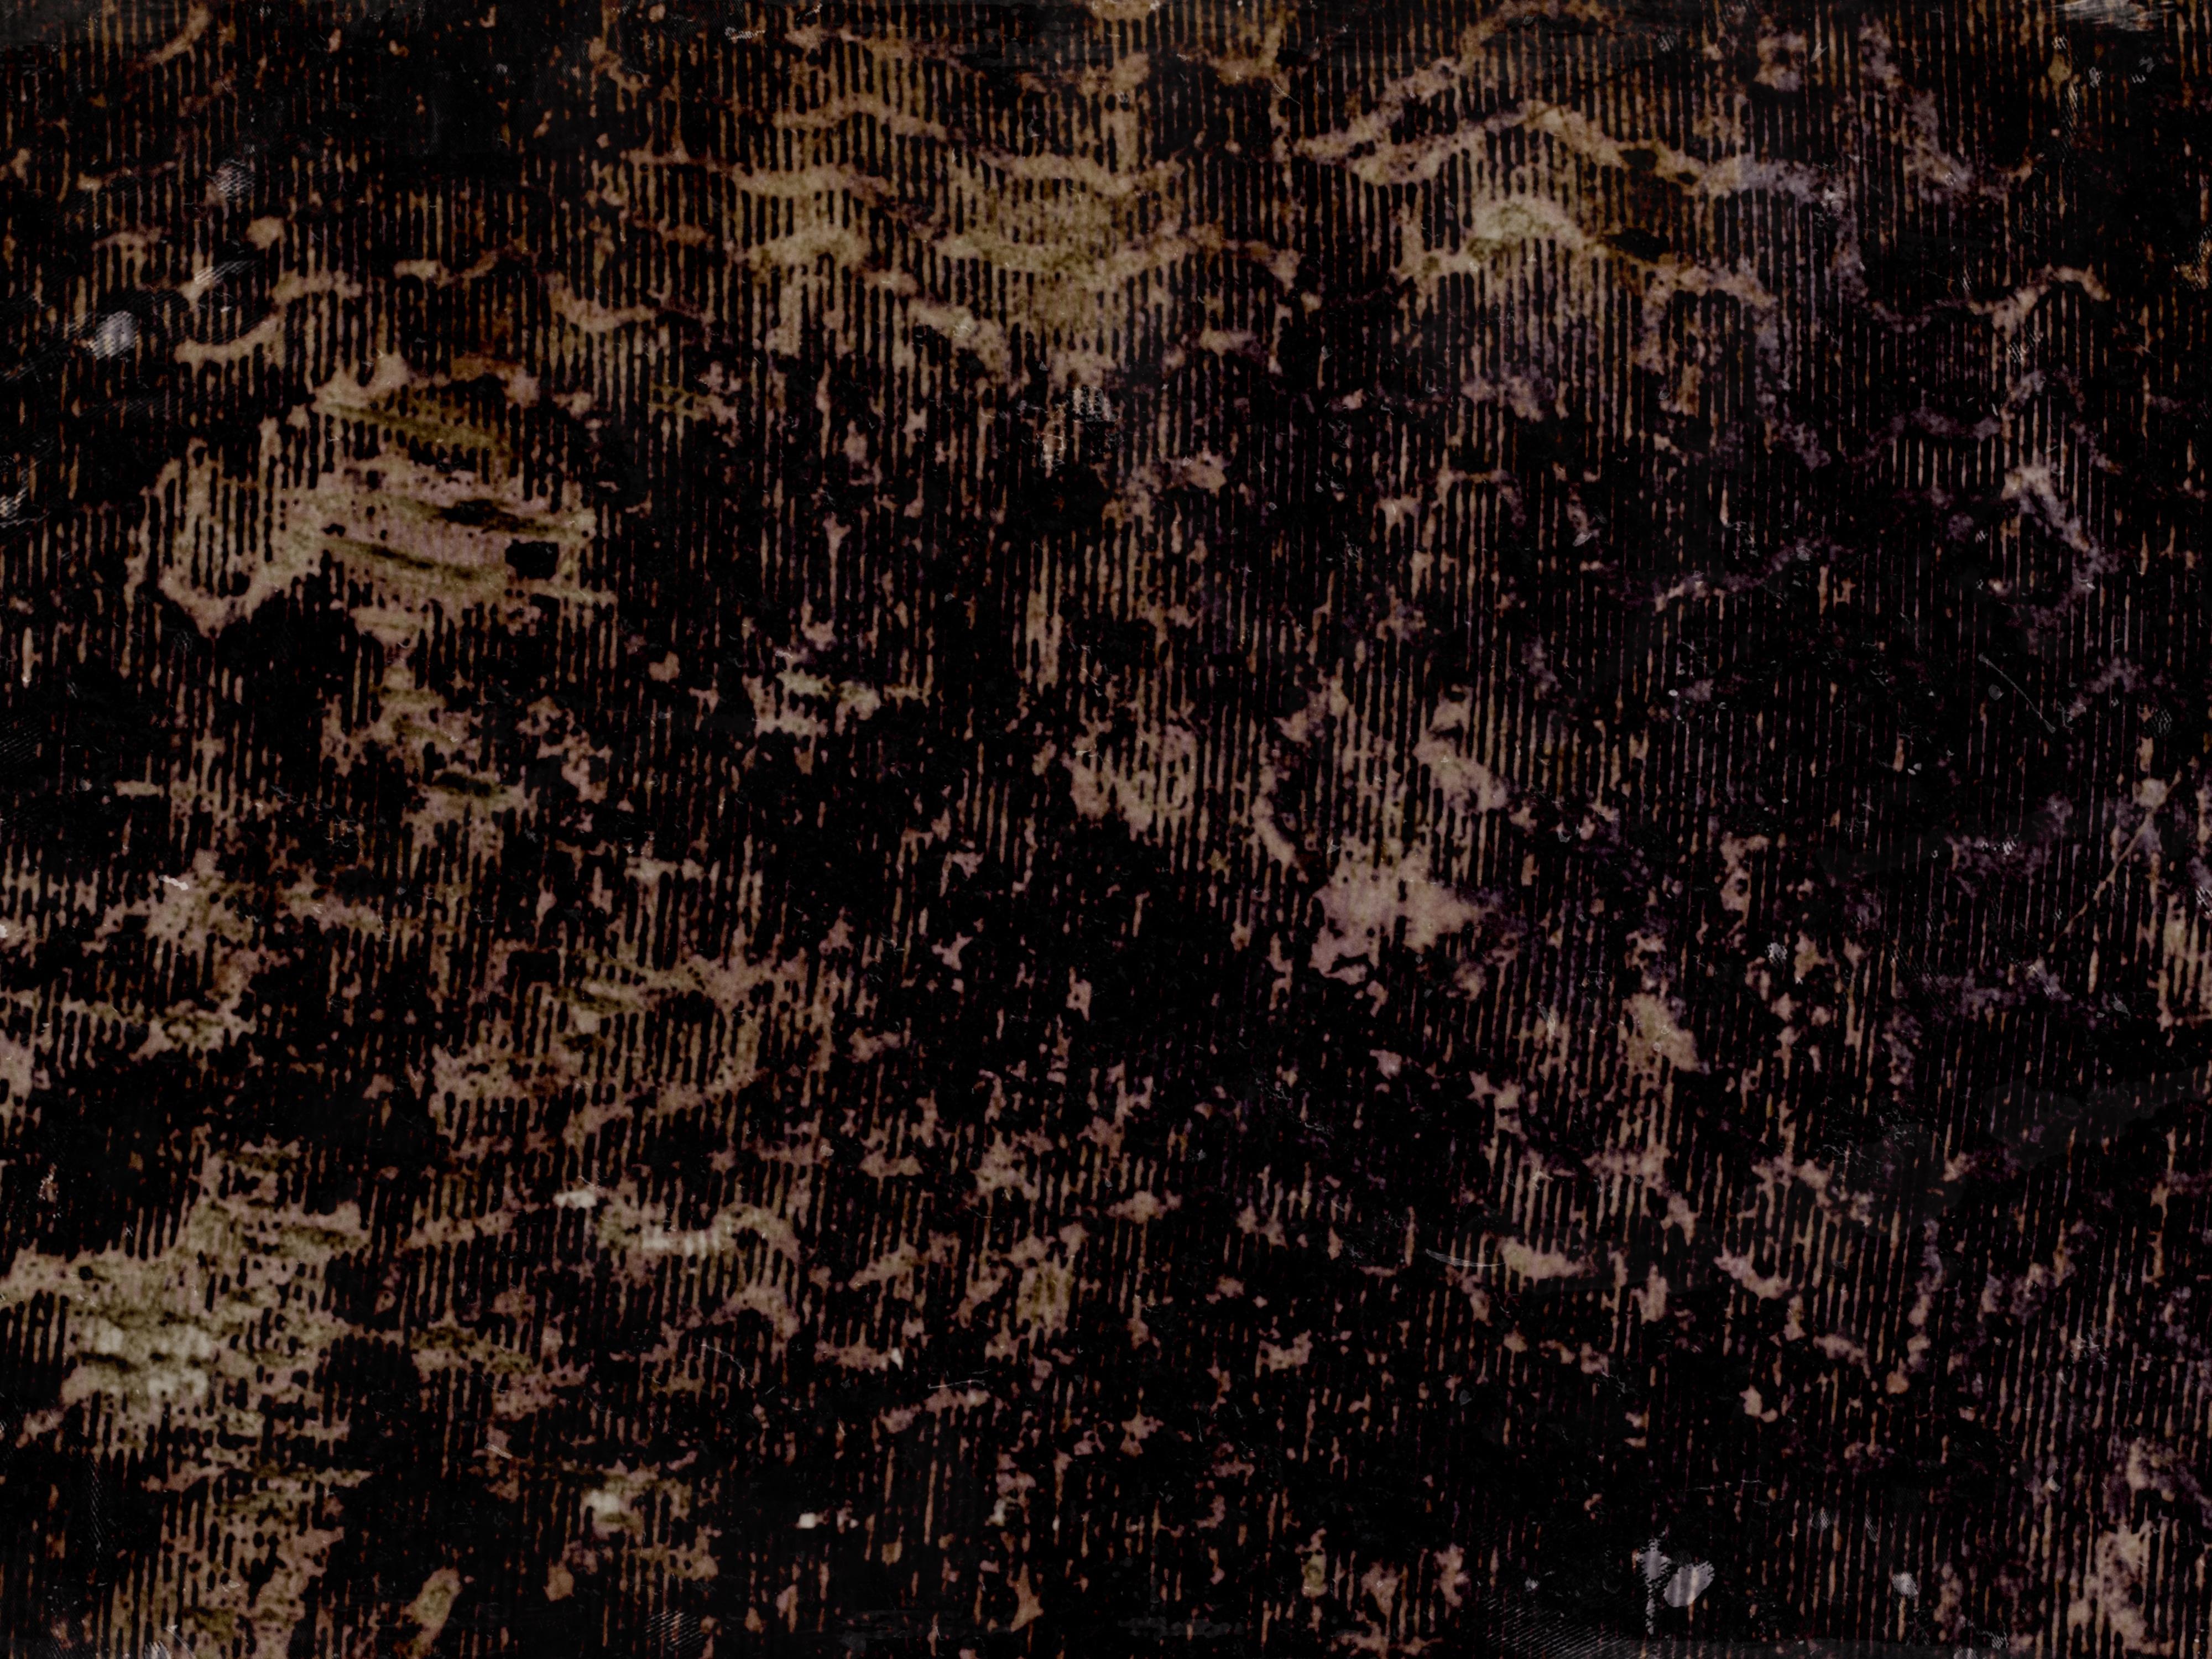 Dark tree background images